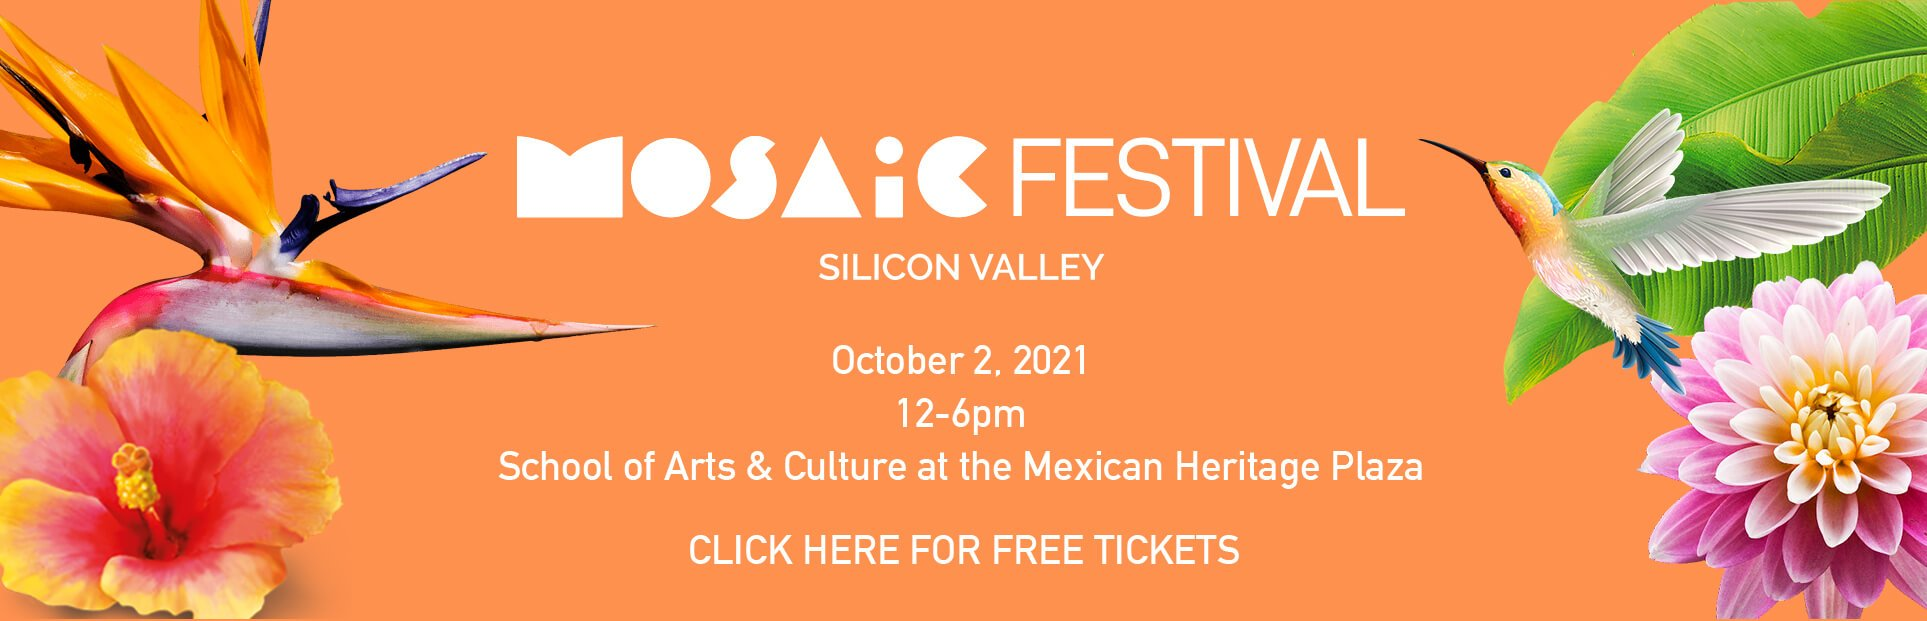 Mosaic Festival - Oct 2, 2021